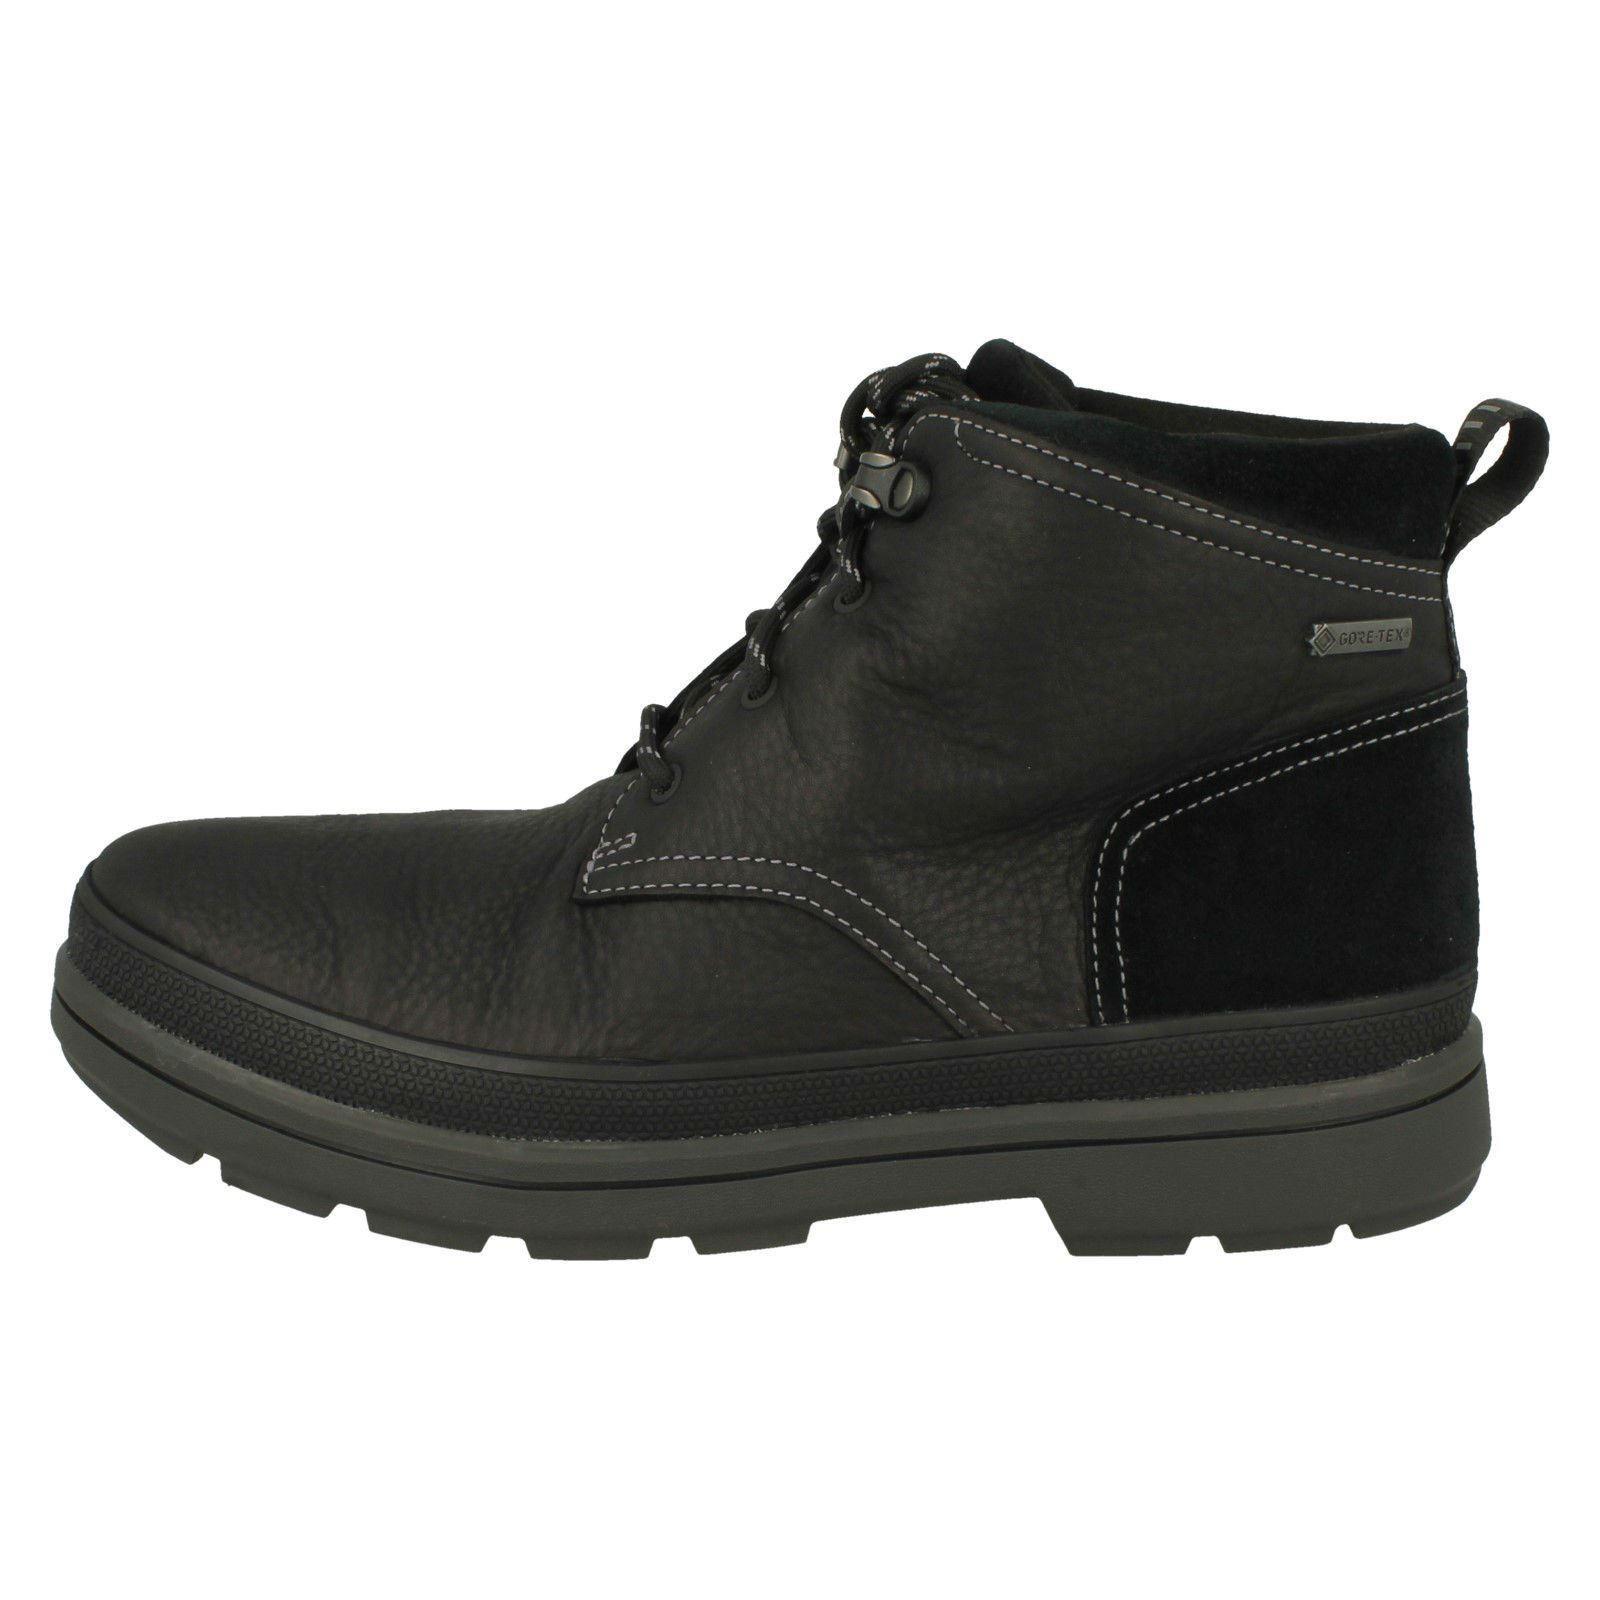 Herren Clarks Gore-Tex Casual Stiefel - - Stiefel Rushway Mid 57f11a